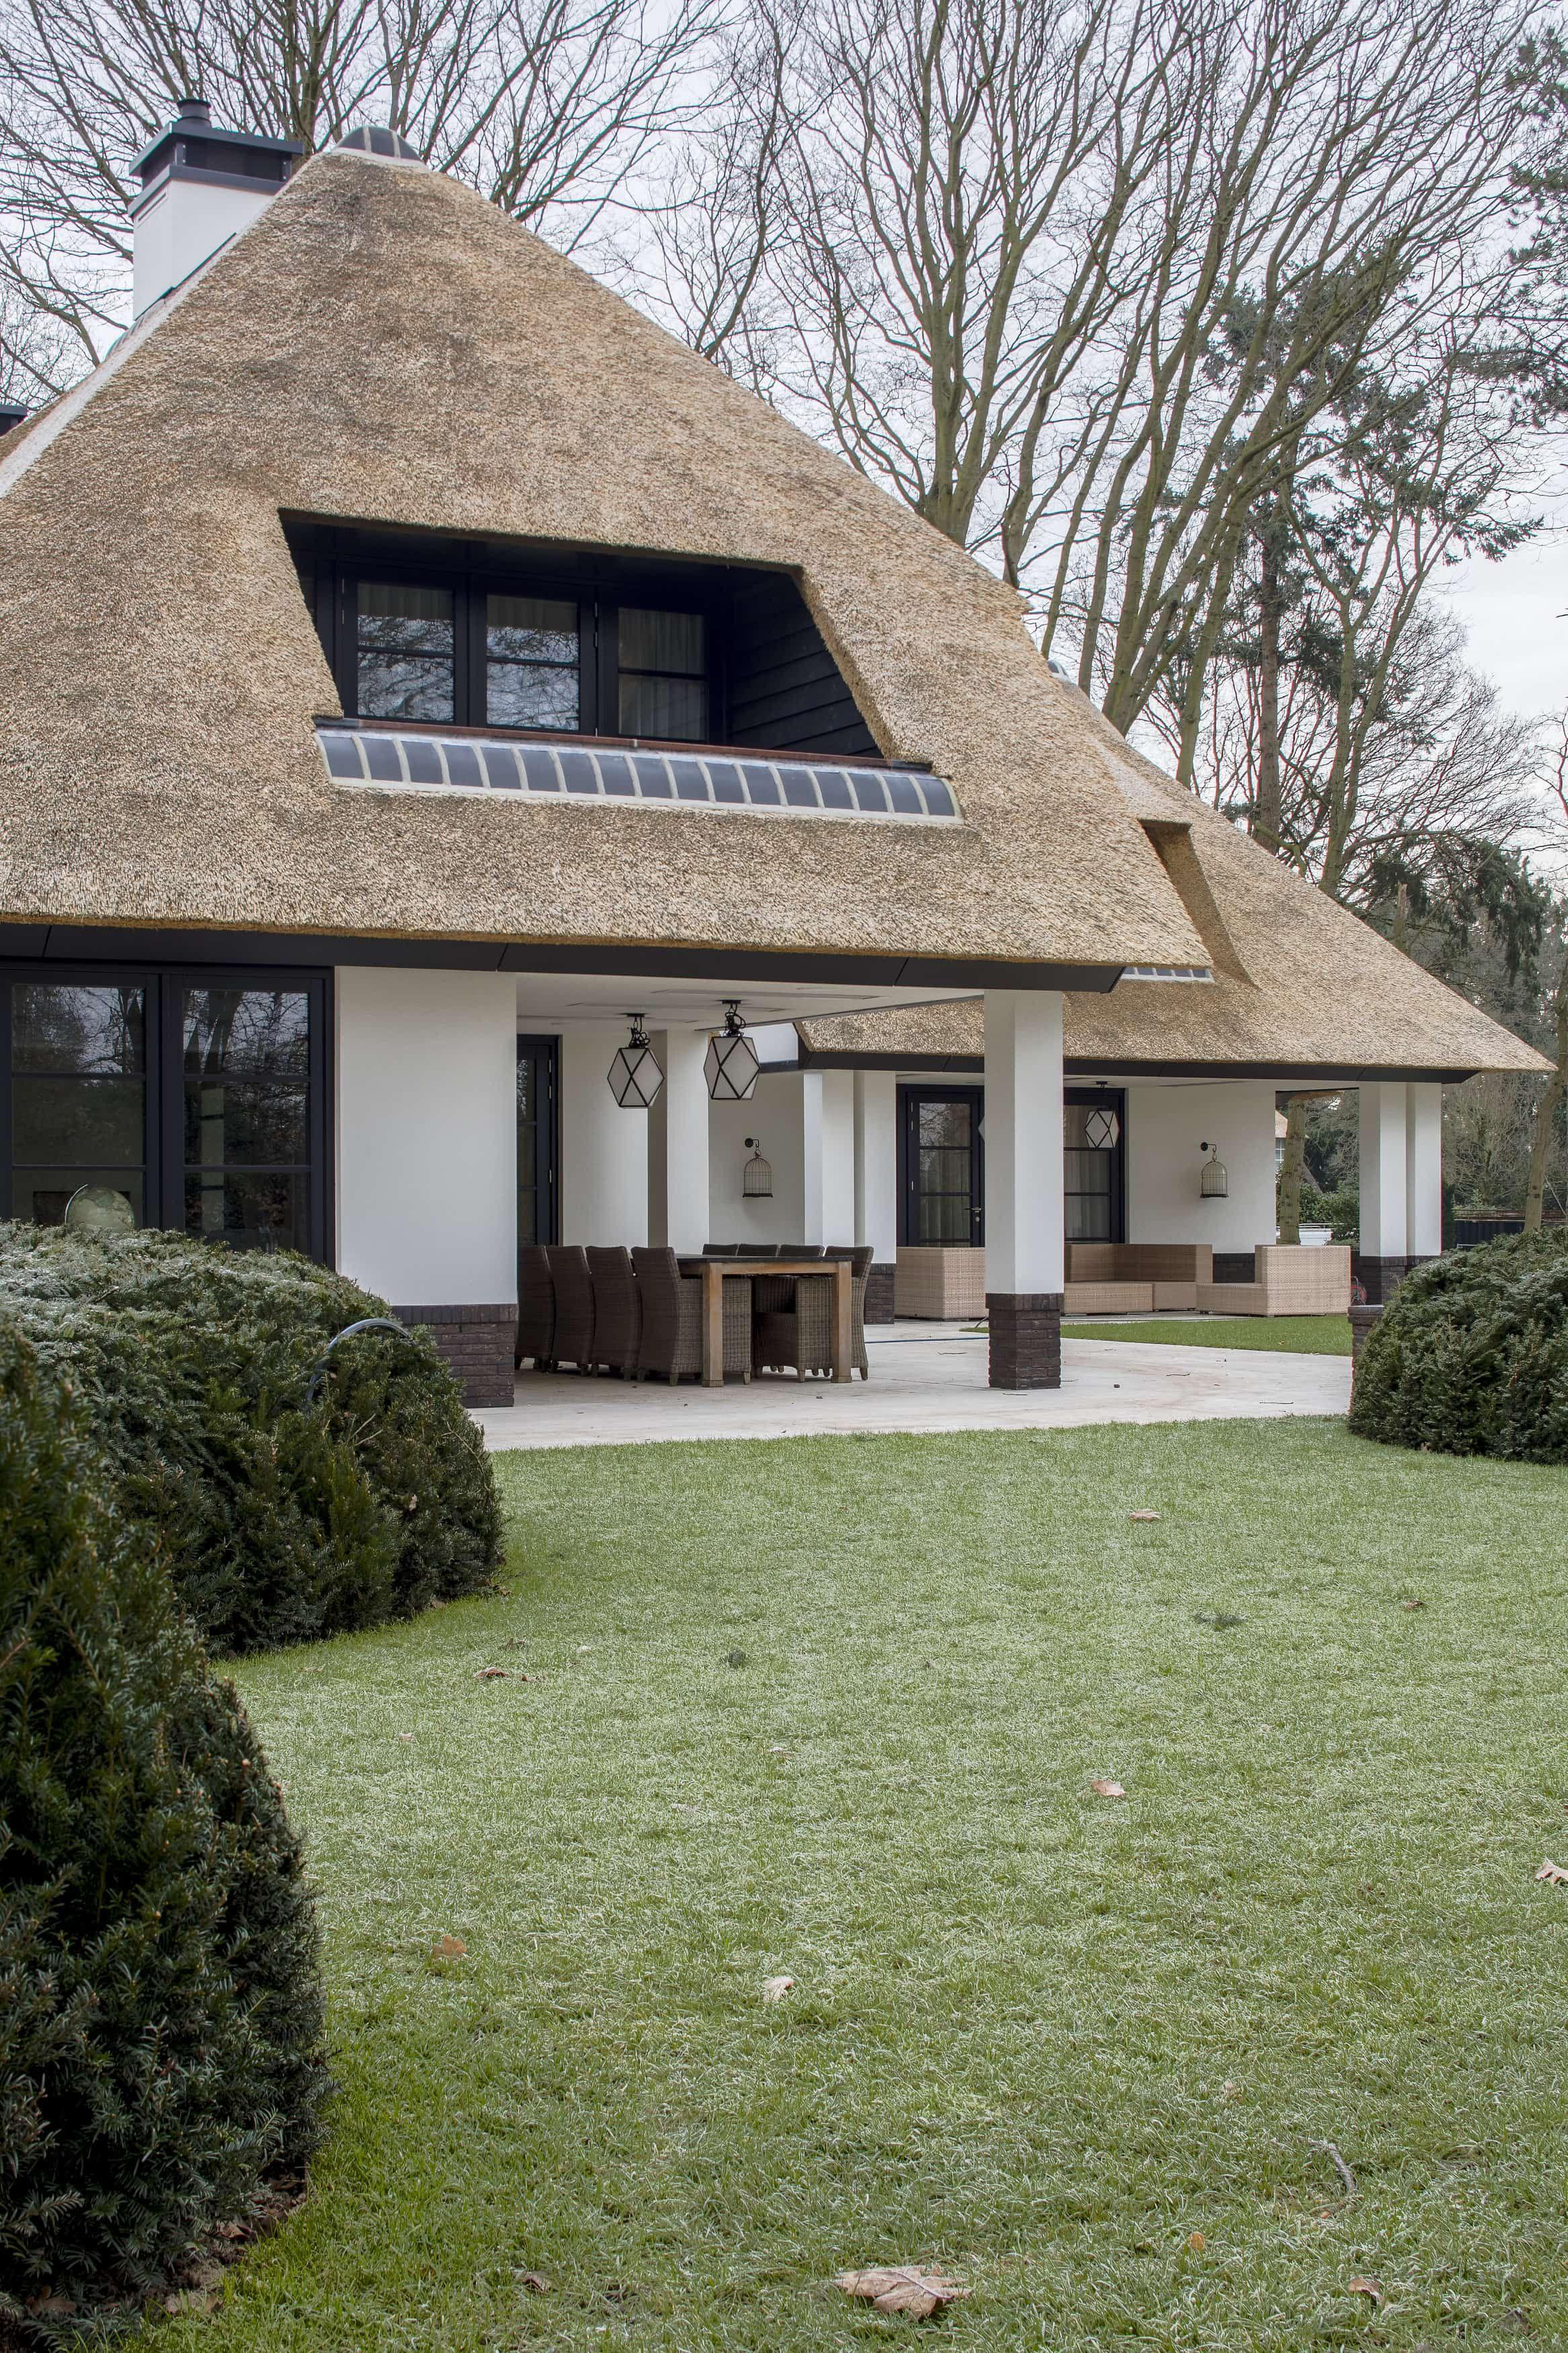 The Netherlands | Stunning Exteriors - House design, House ...